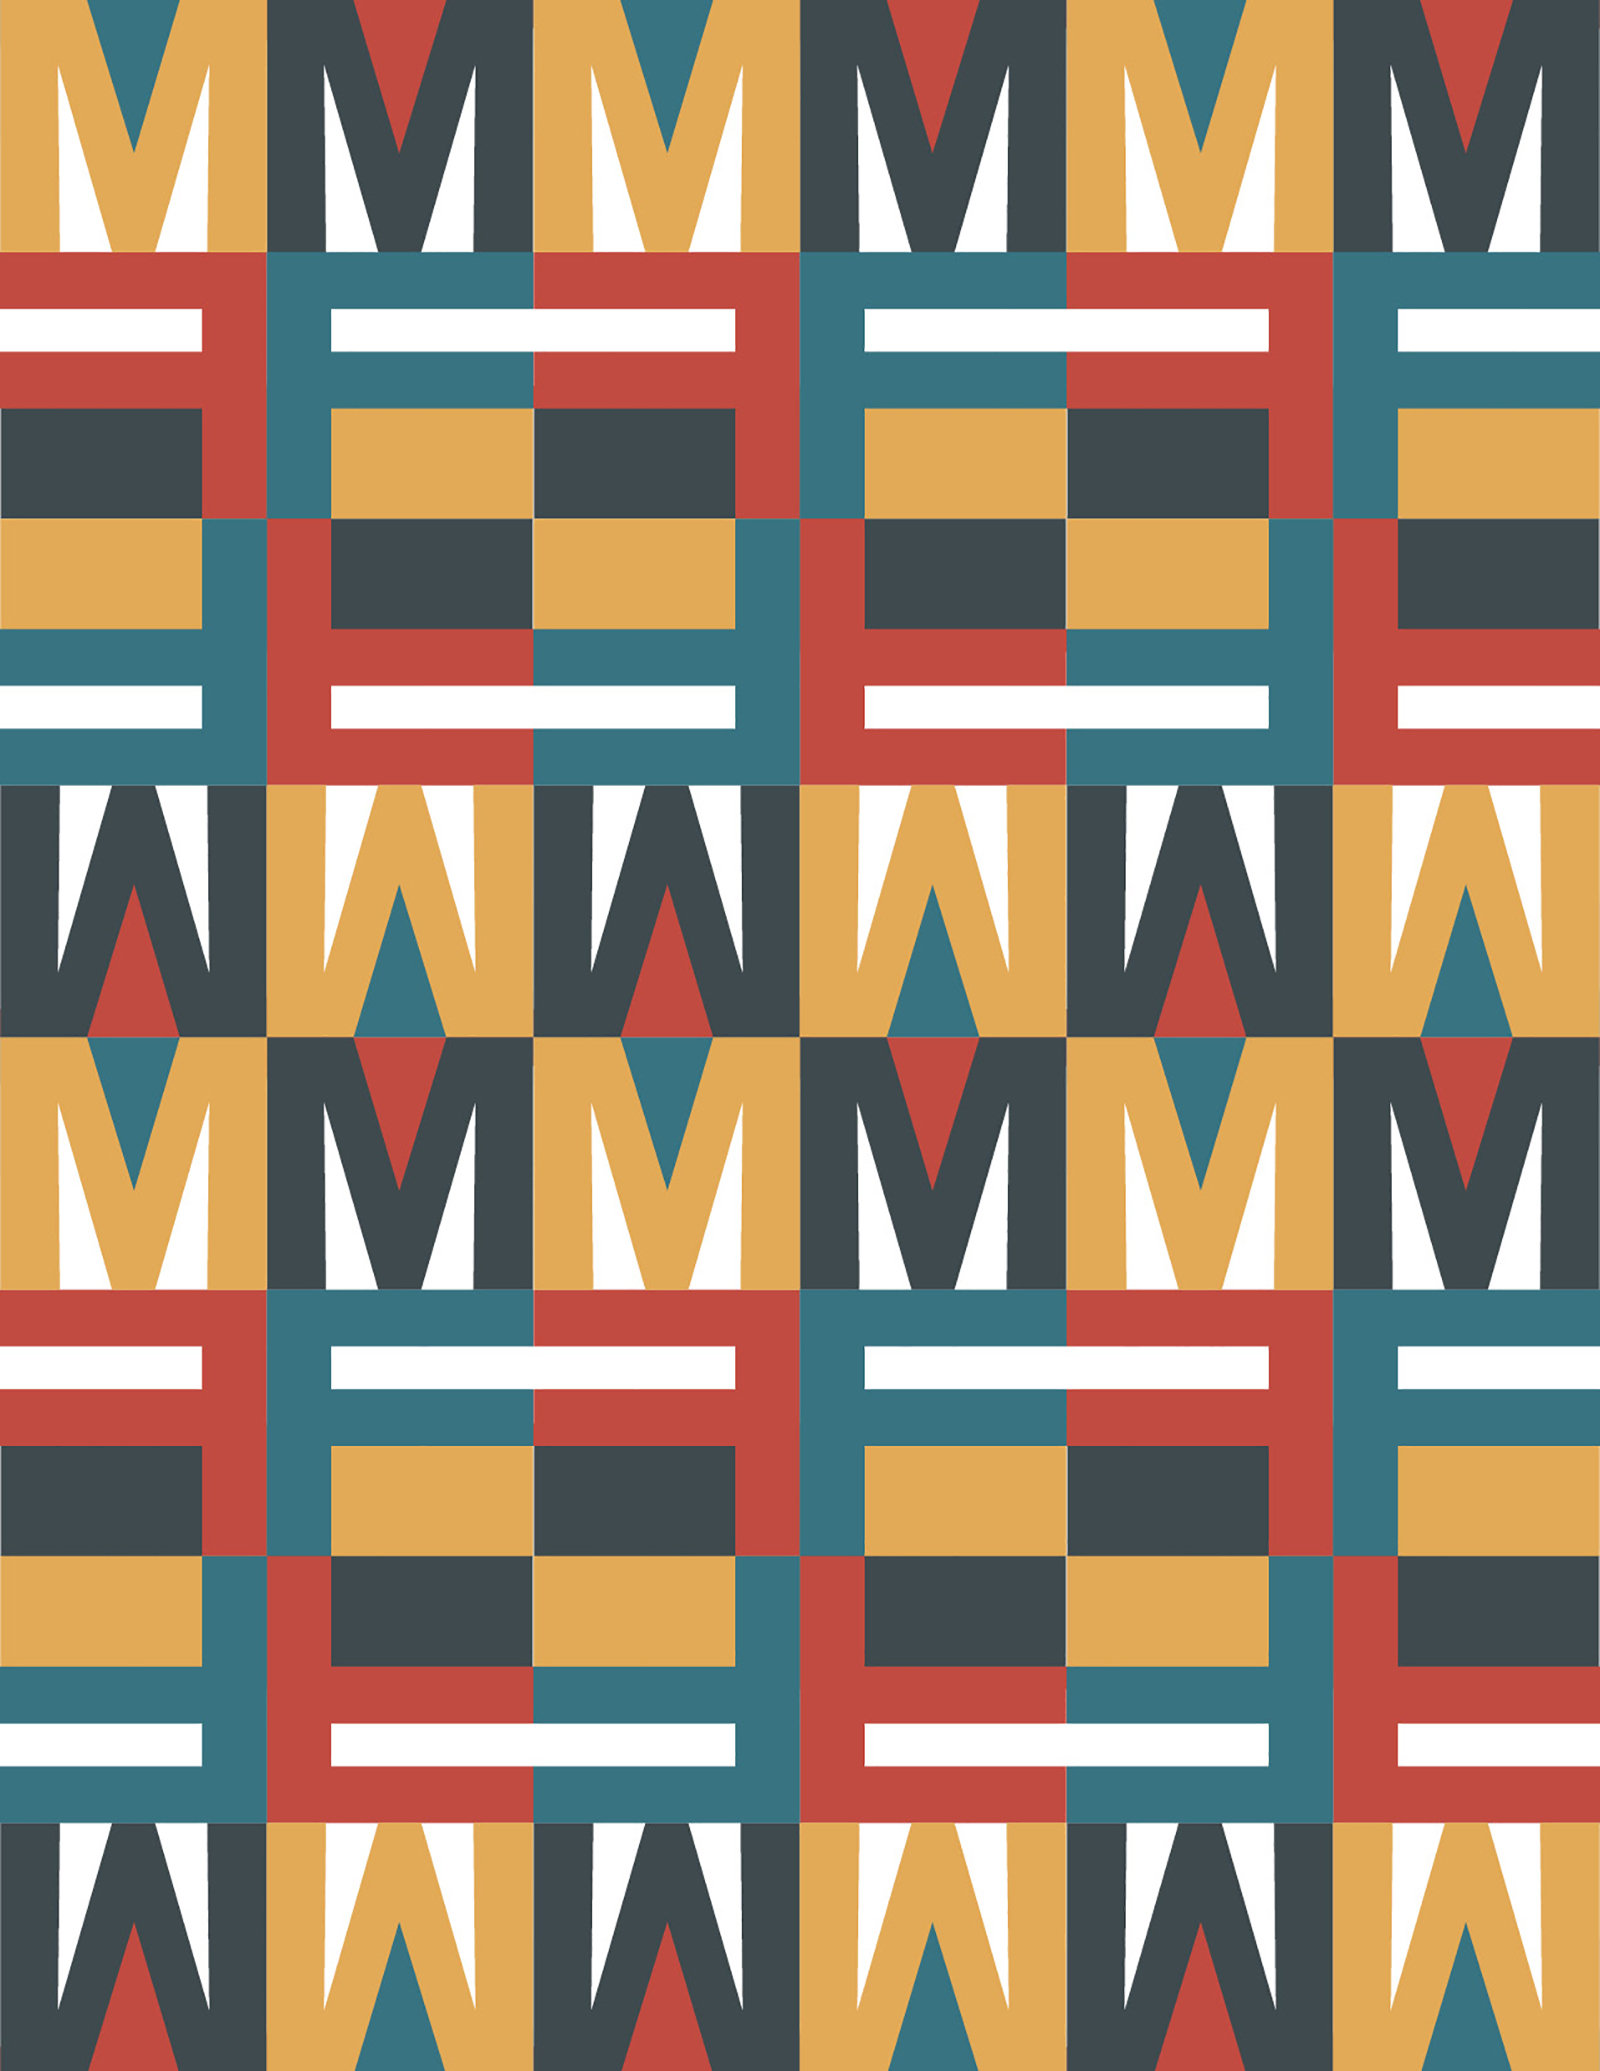 MMFF logo drafts3.jpg